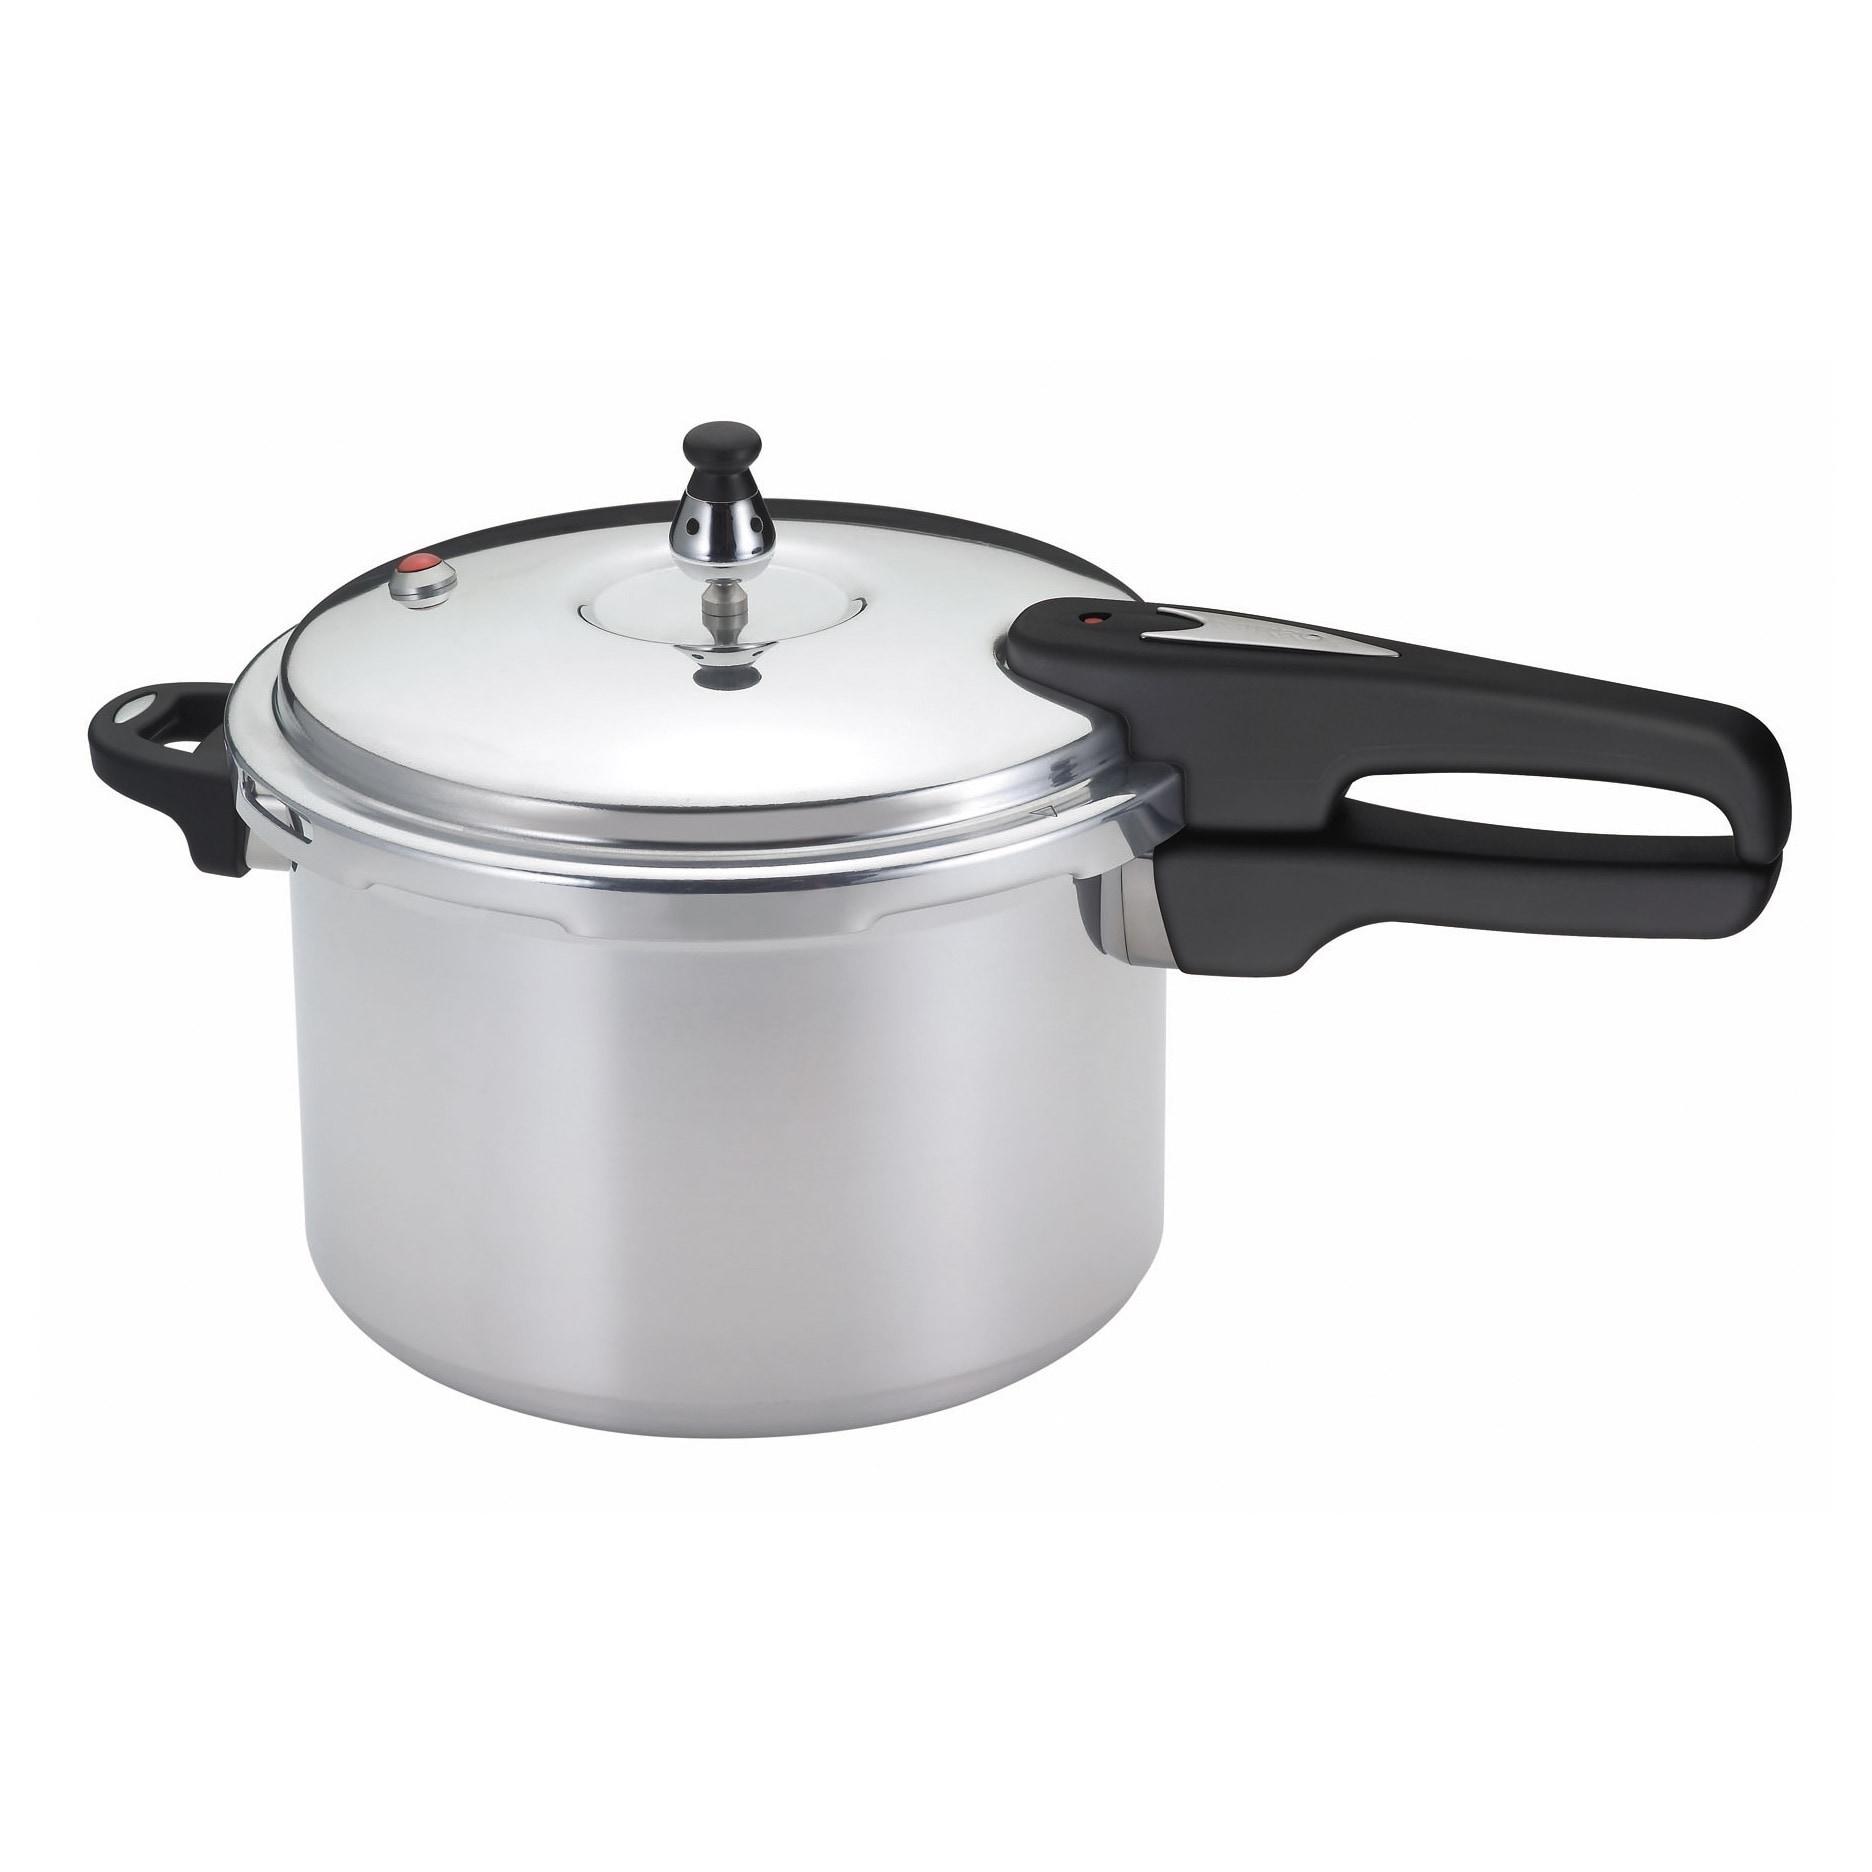 Mirro 6-quart Pressure Cooker (6qt Pressure Cooker), Silv...